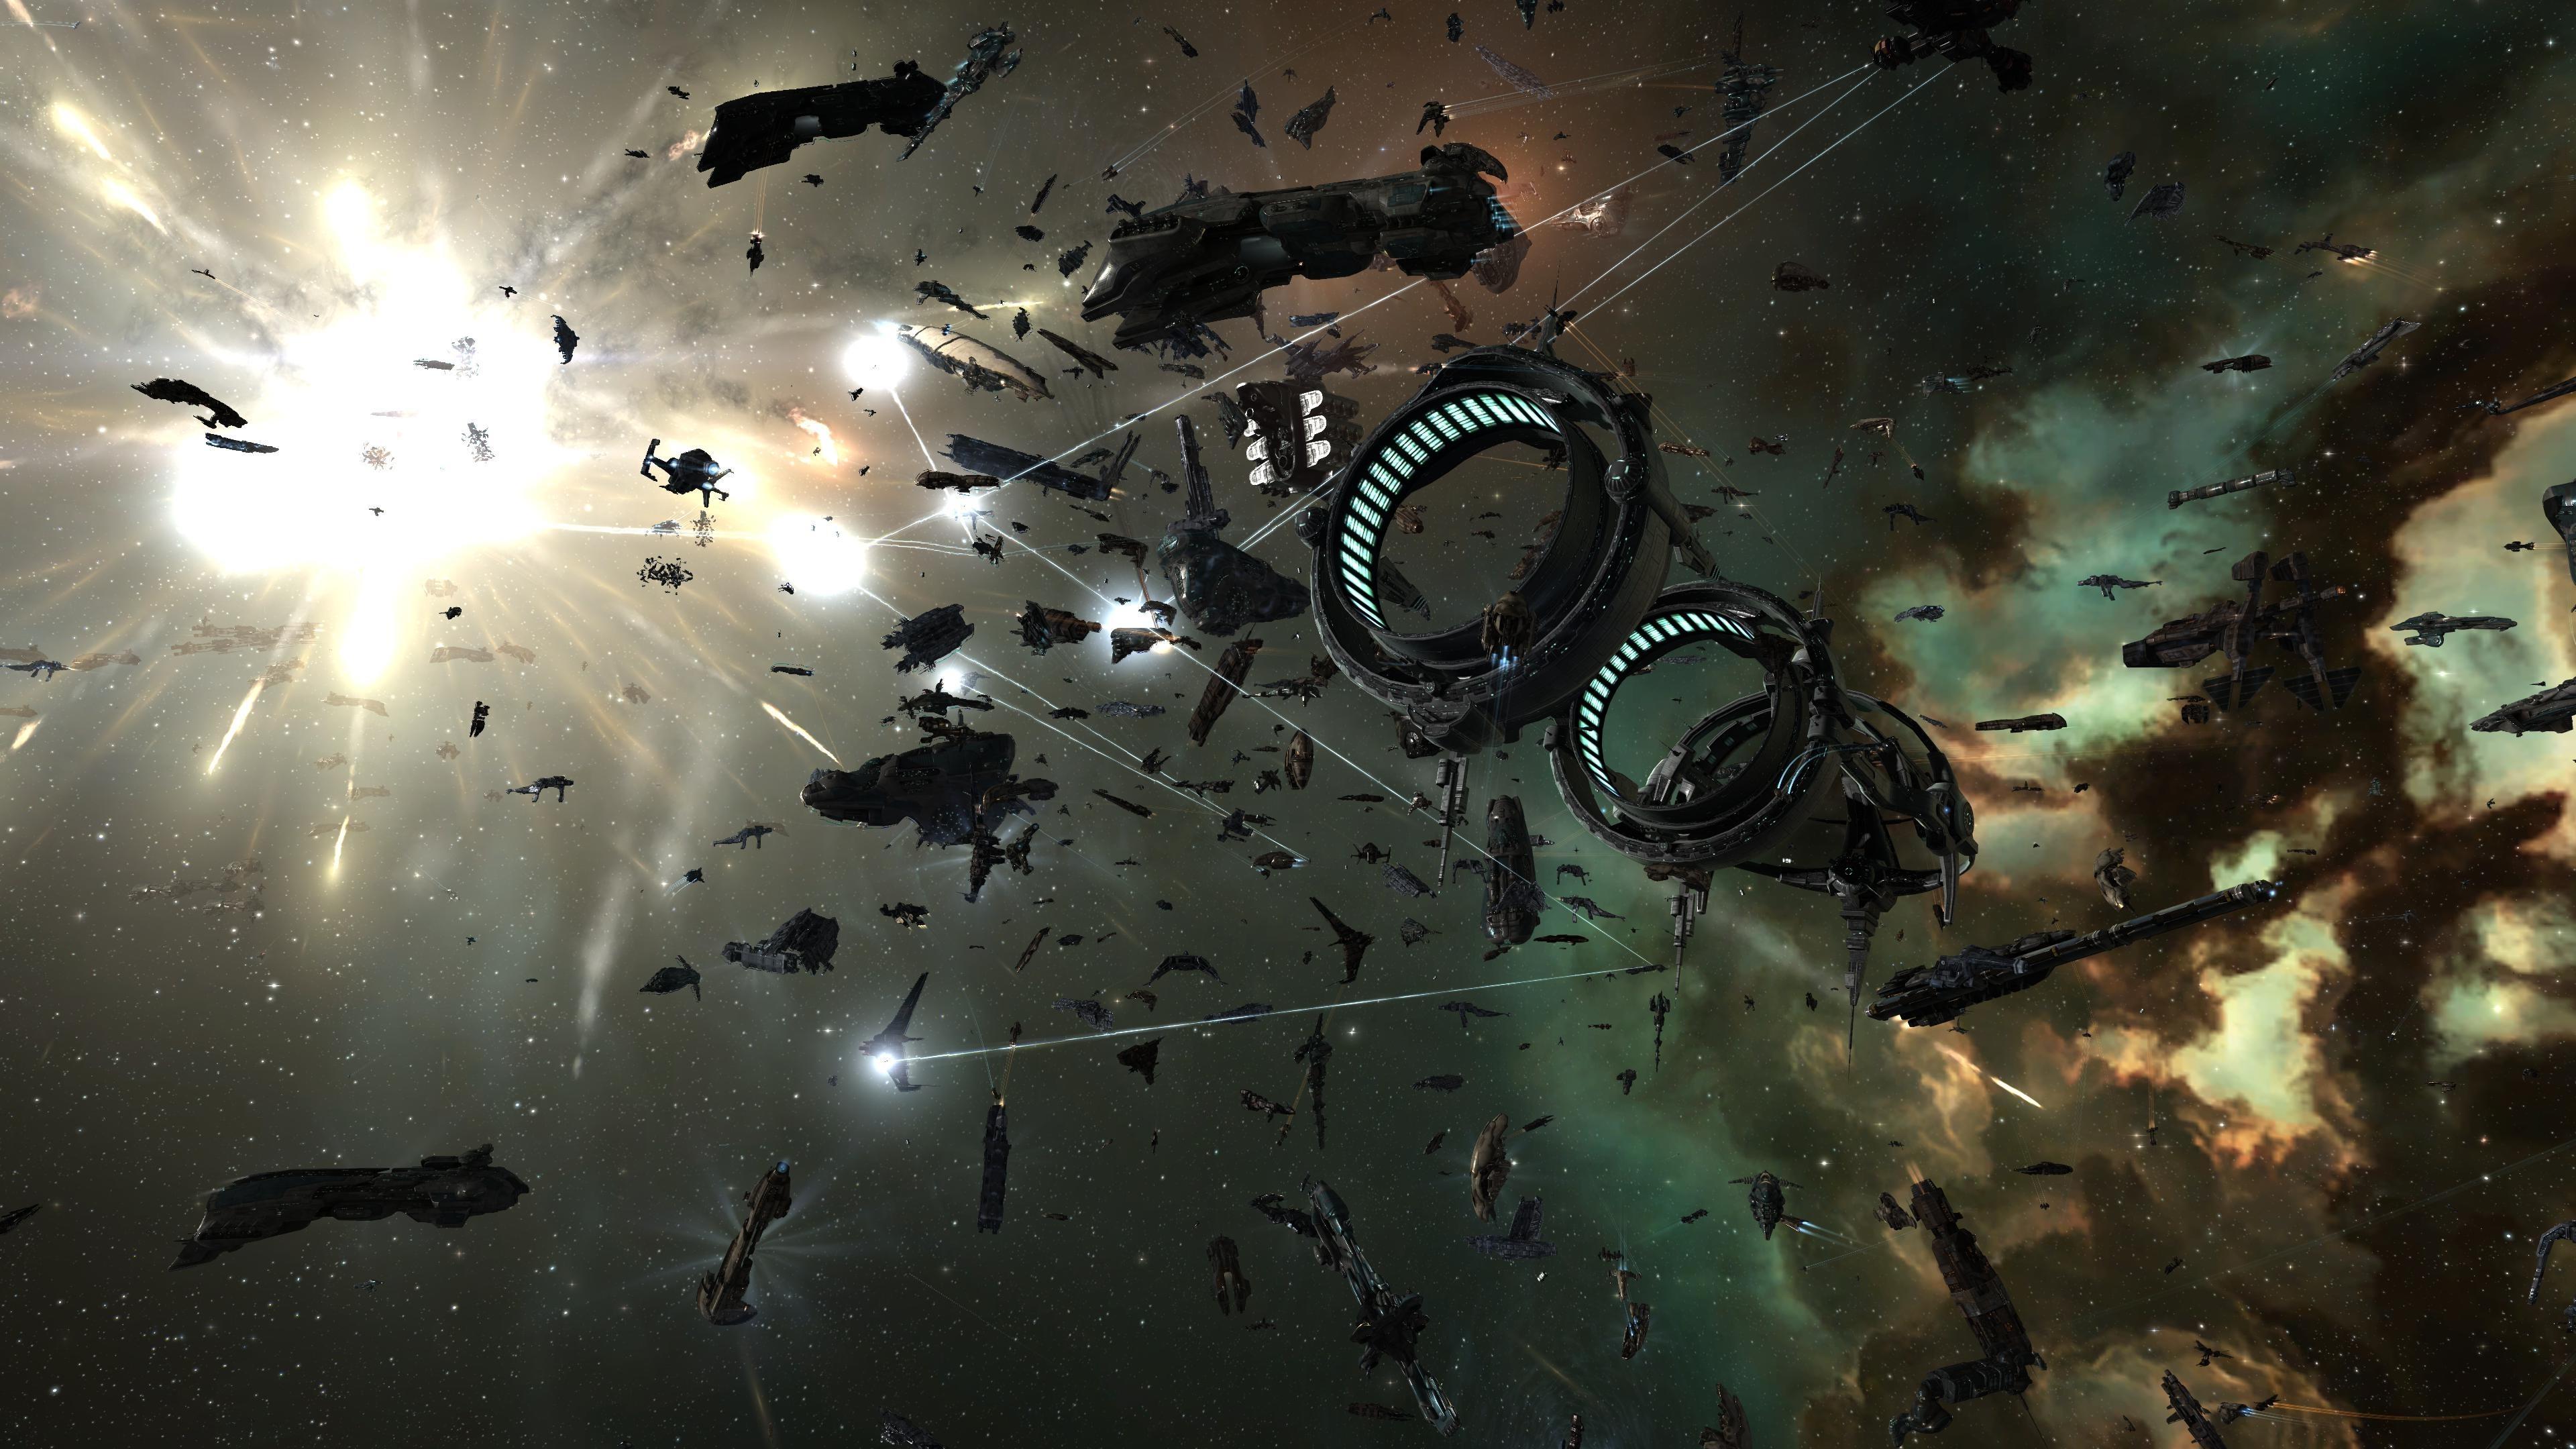 … Widescreen Resolutions Desktop Background Images. EVE Online, Burn  Jita, Space, Spaceship, Space Battle